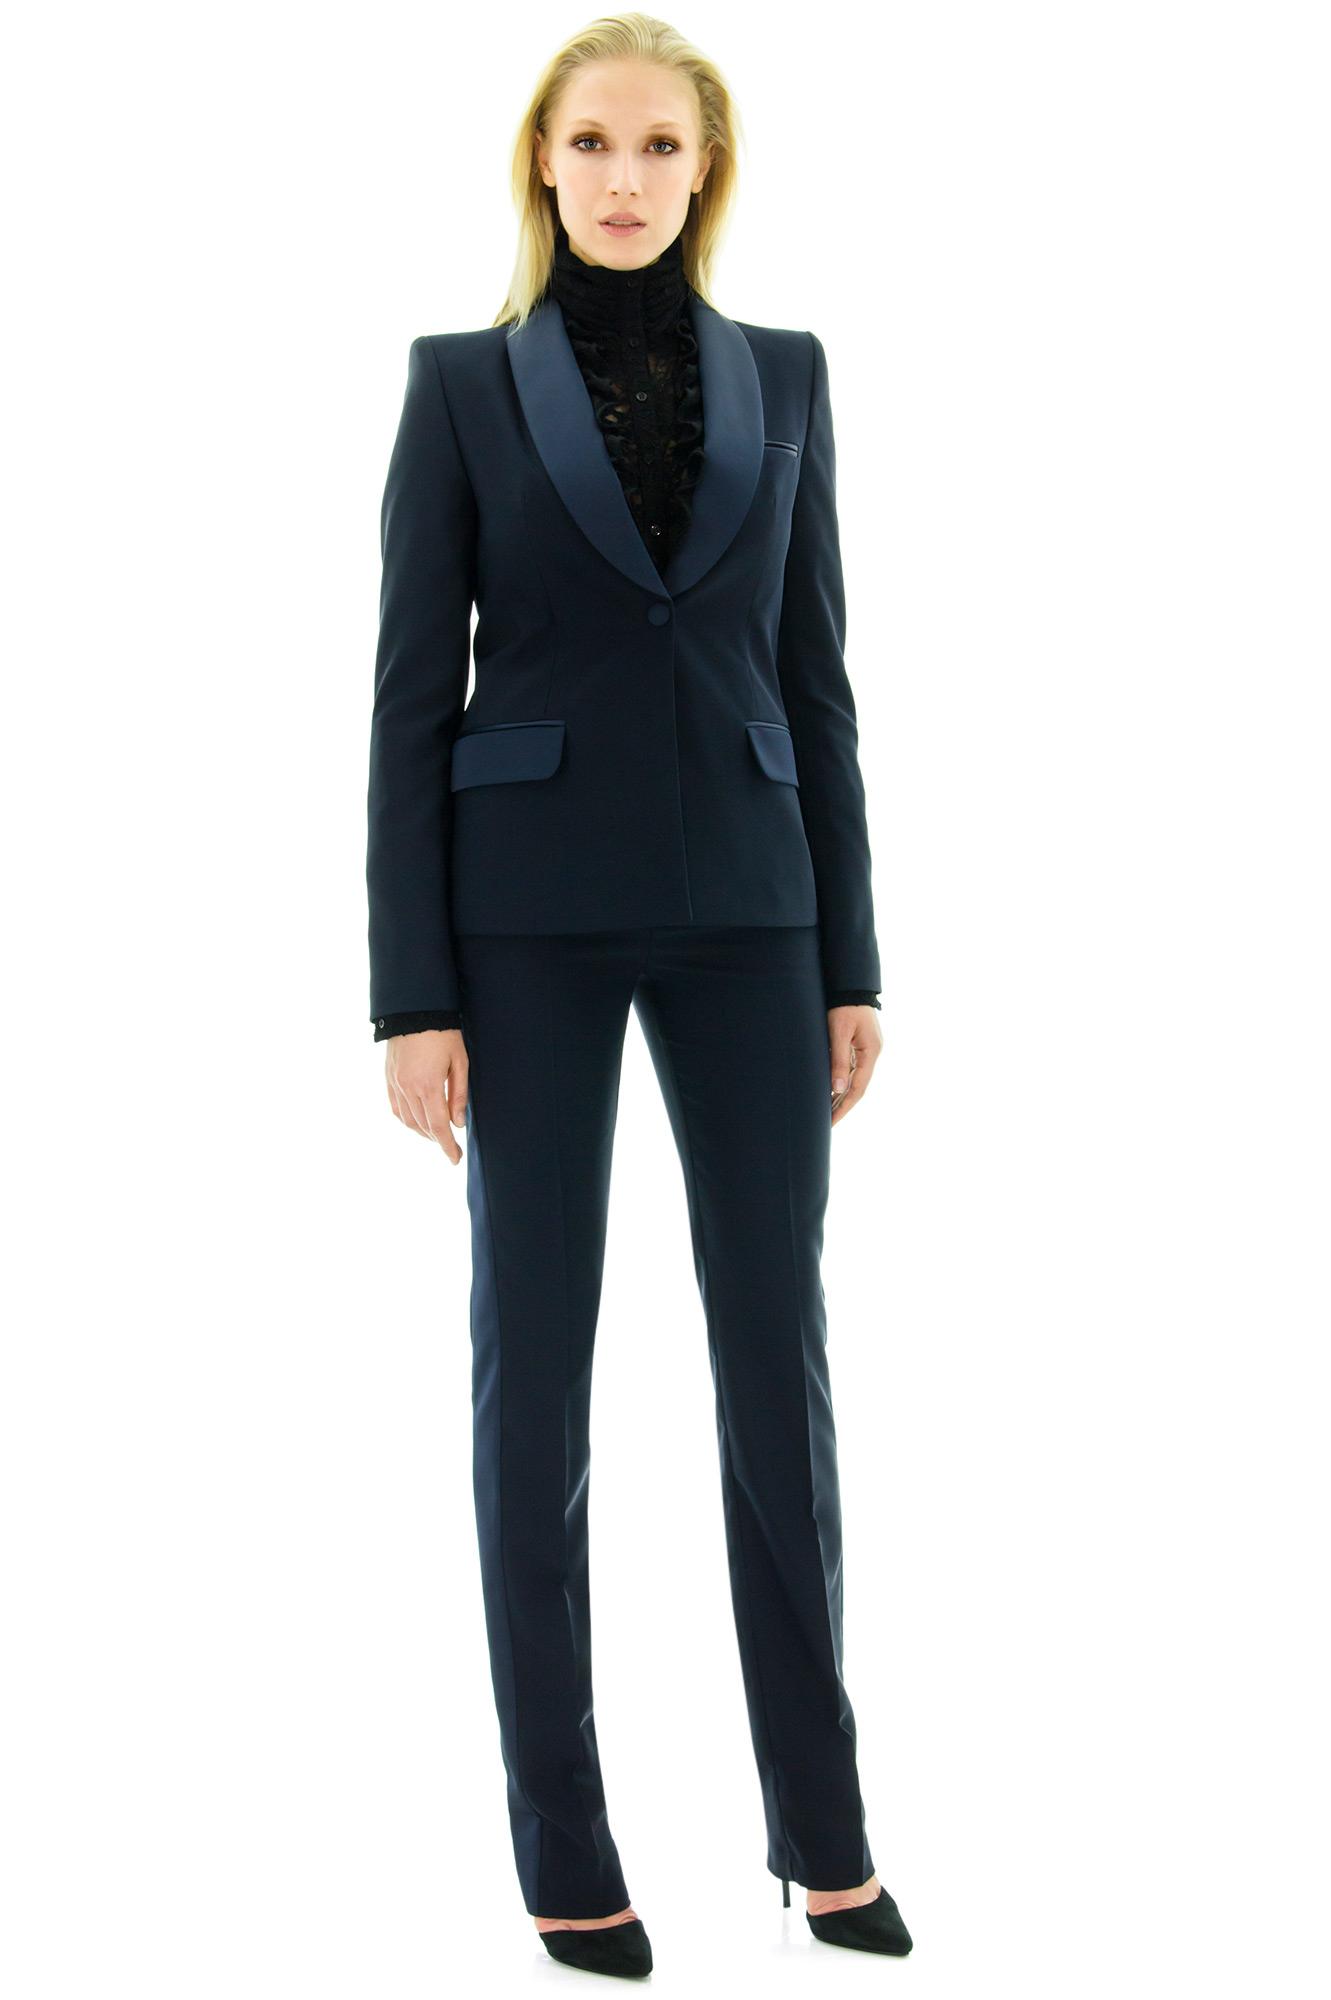 pantalon de smoking pantalon femme smoking bleu stefanie stefanie renoma. Black Bedroom Furniture Sets. Home Design Ideas